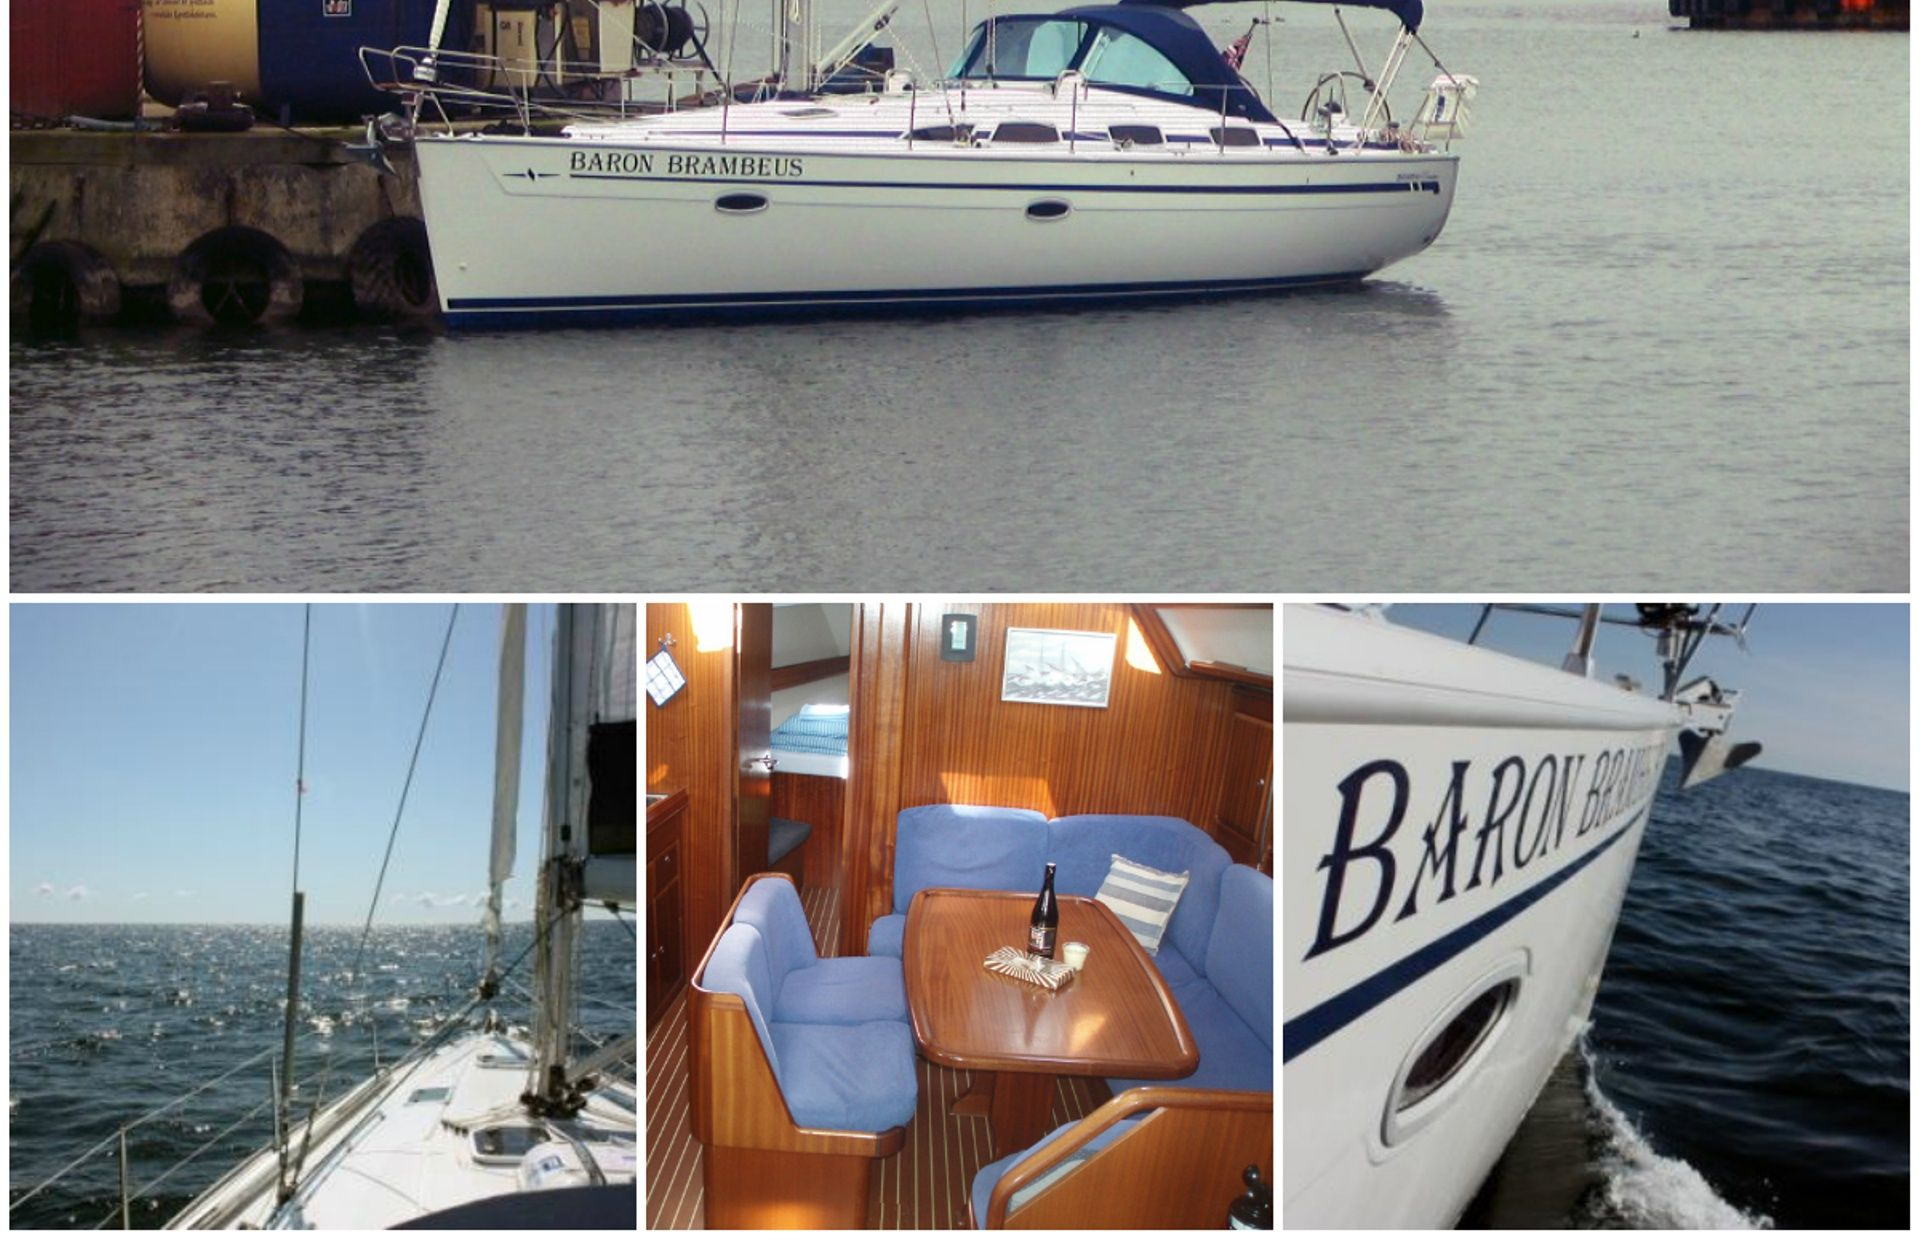 https://media.insailing.com/boat/baron-brambeus/image_1565005606517.jpg